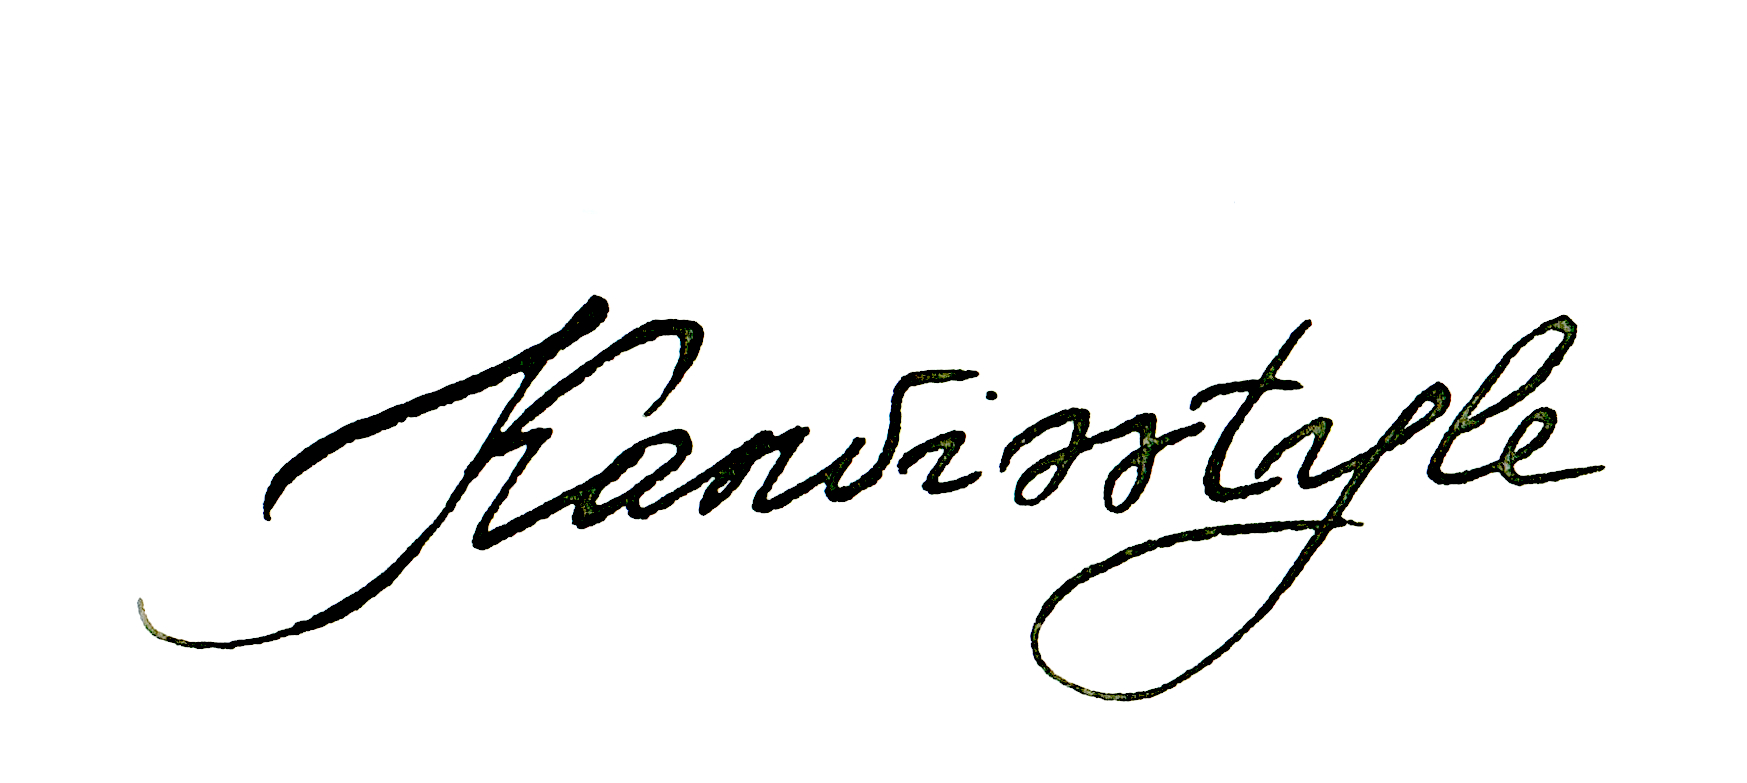 KANVISSTYLE Signature